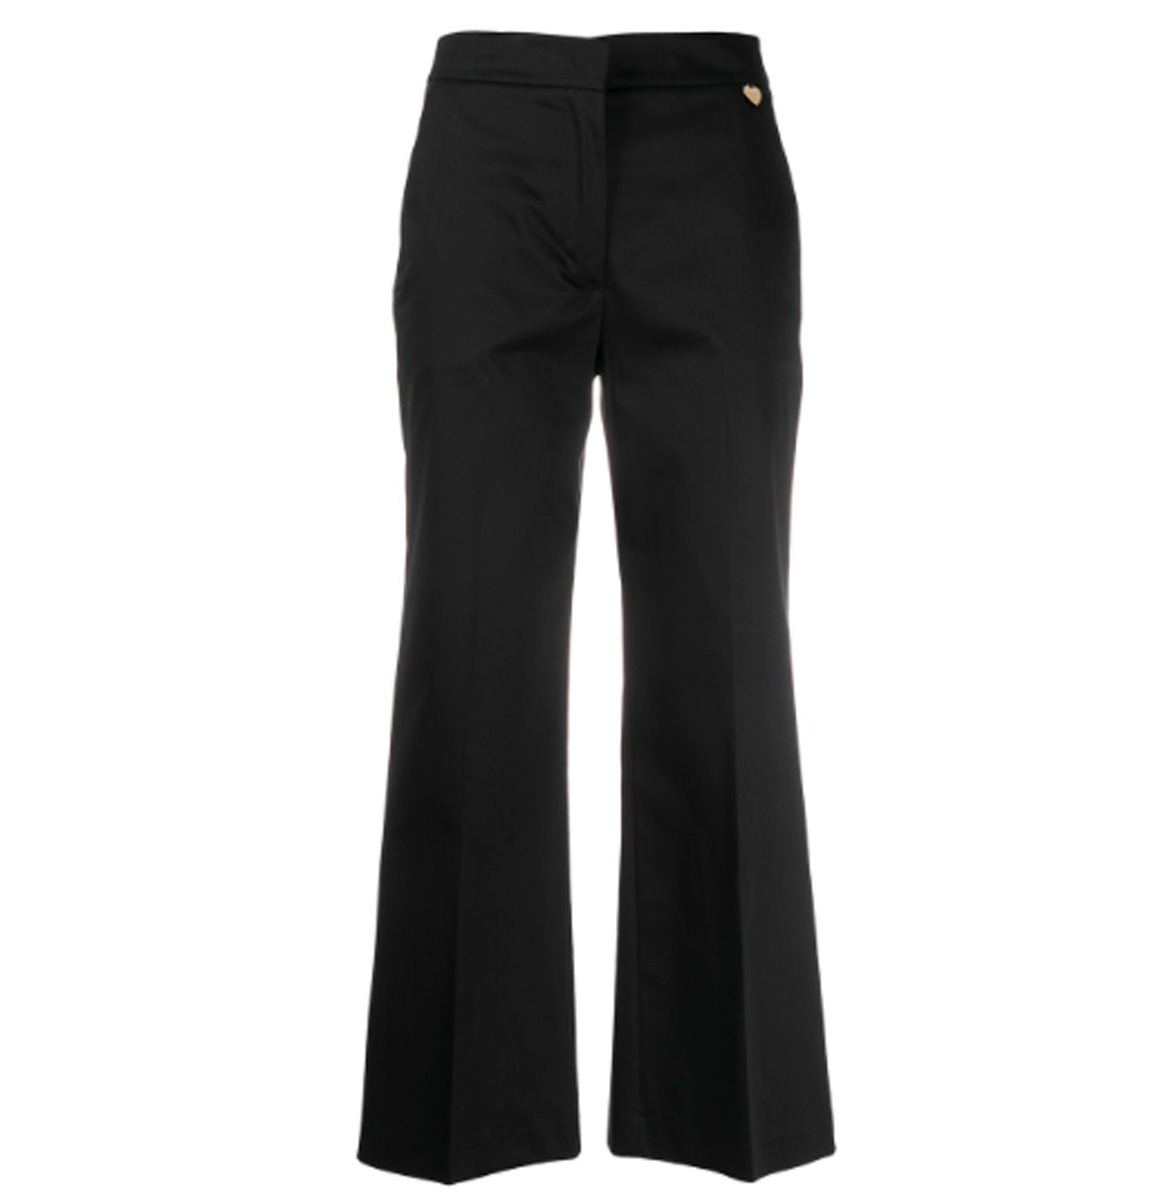 Twin-Set A/W Pantalon nero Twinset